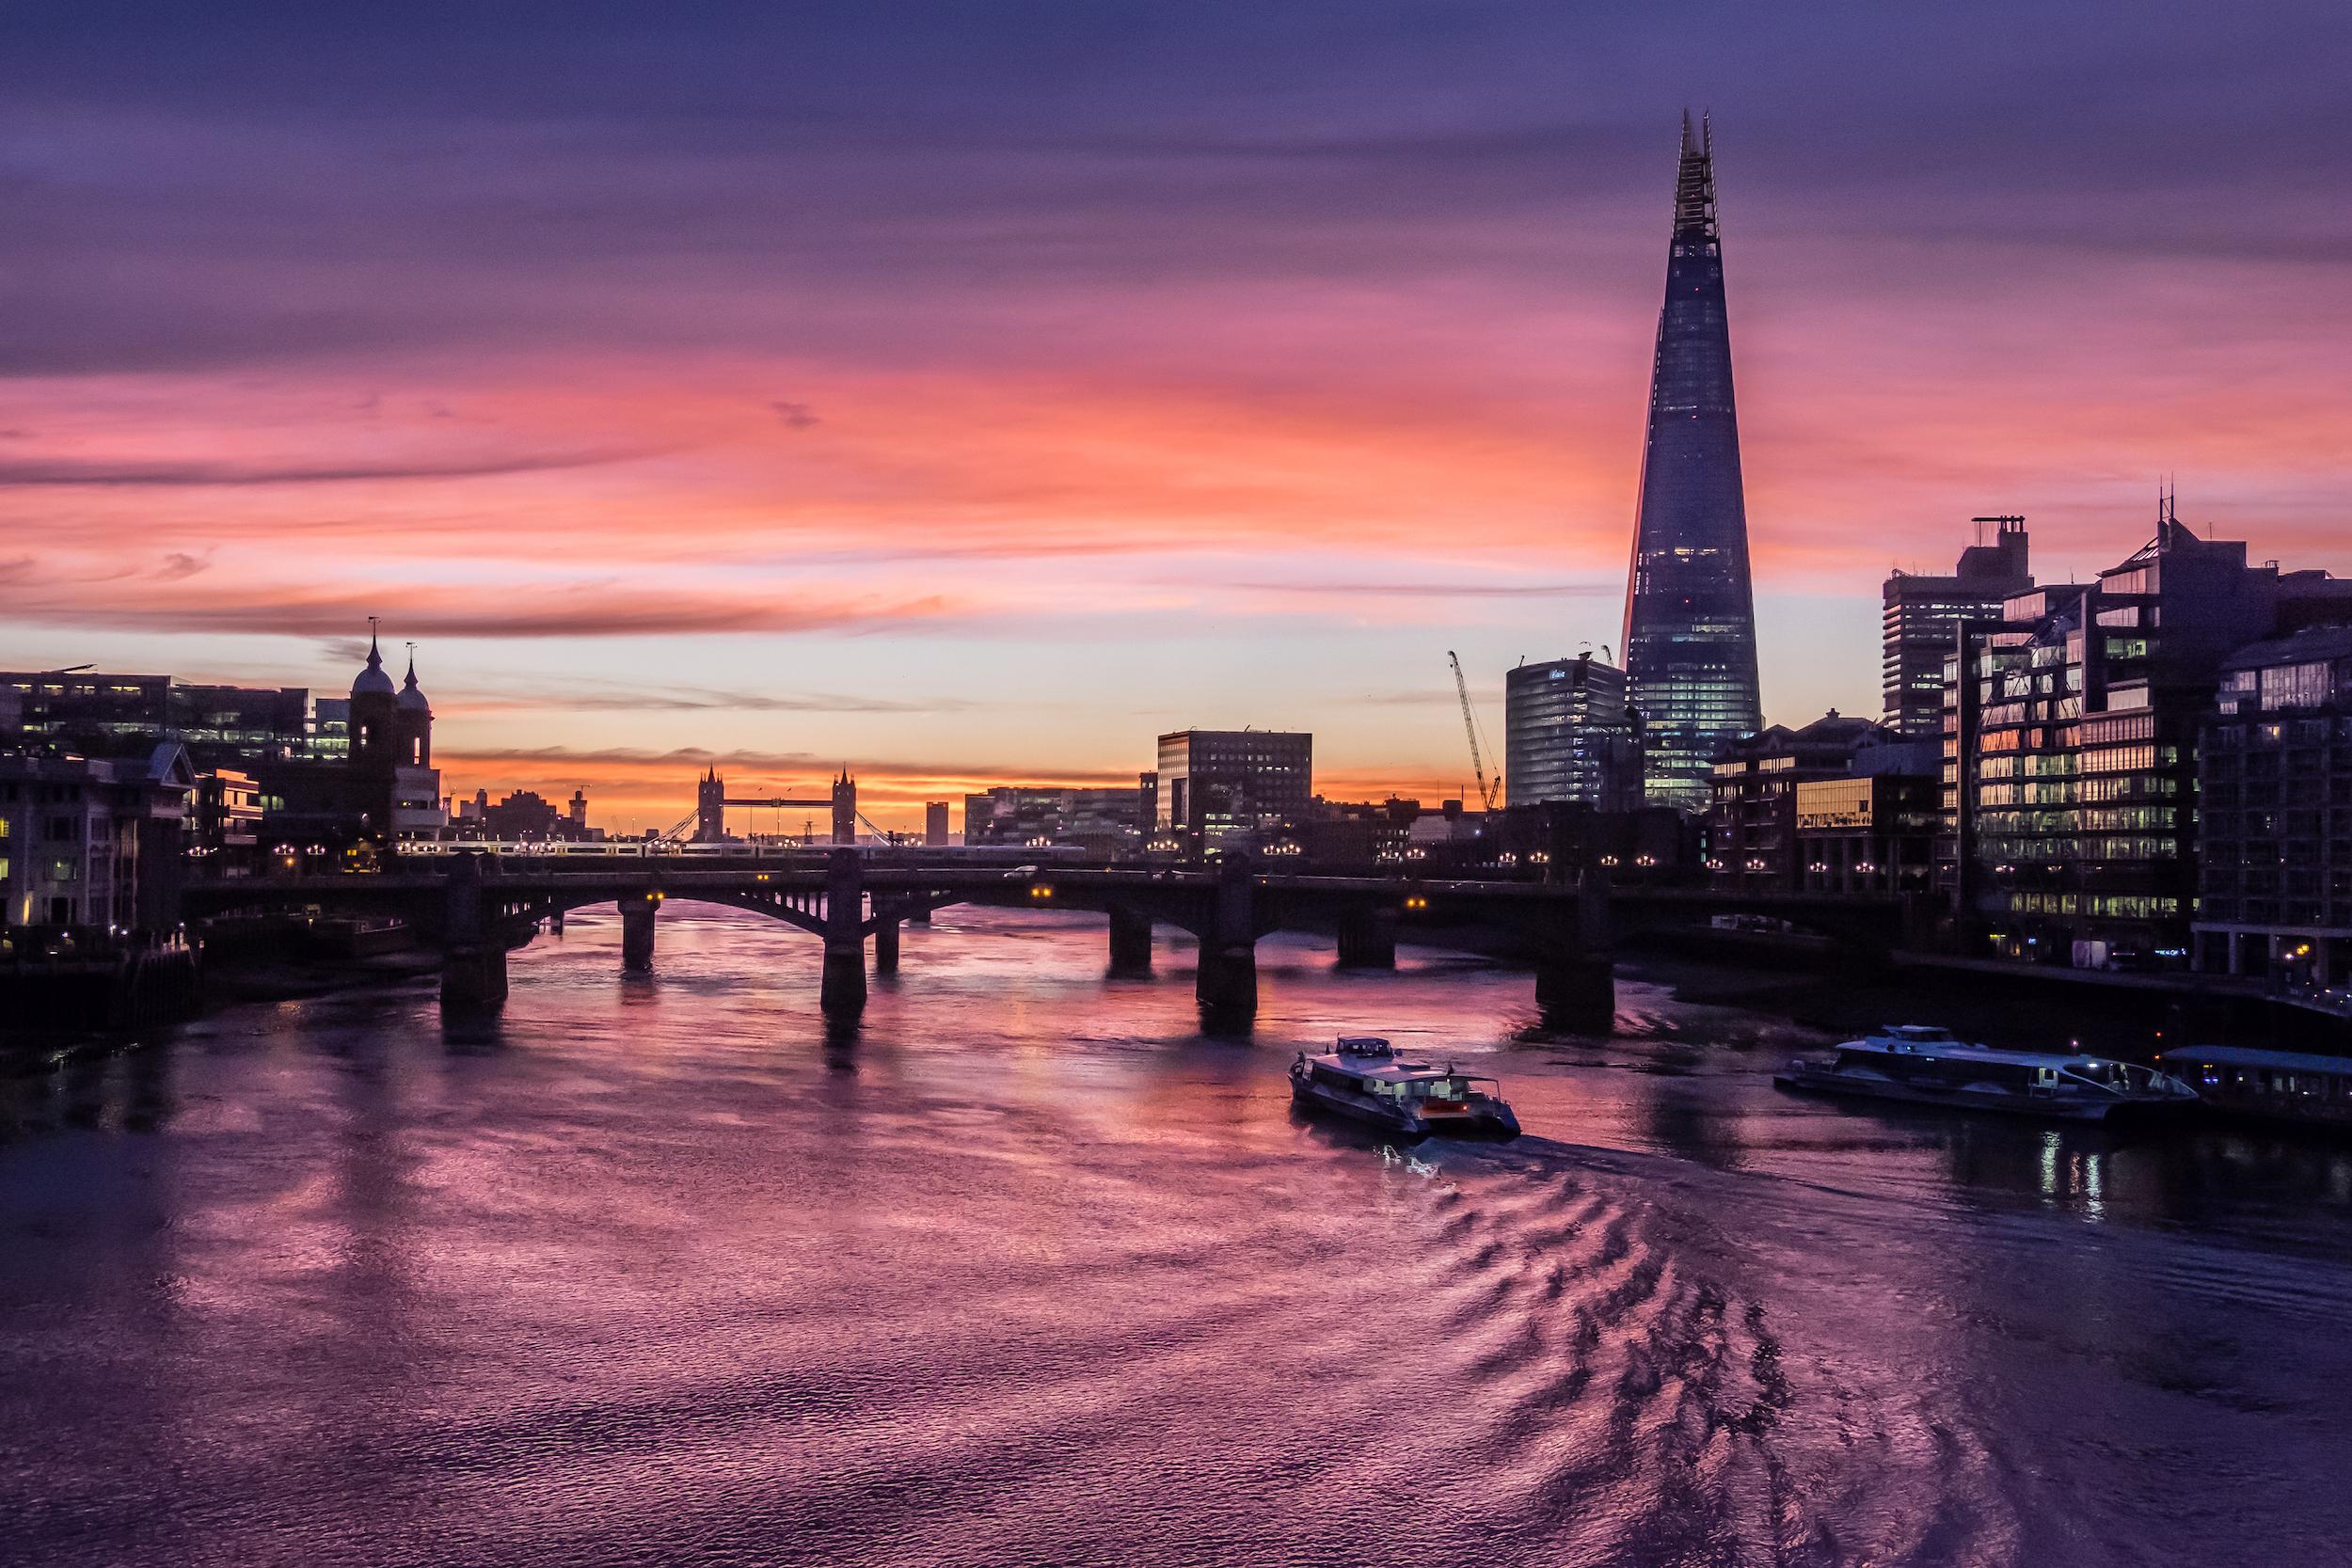 Dawn at the River Thames, London